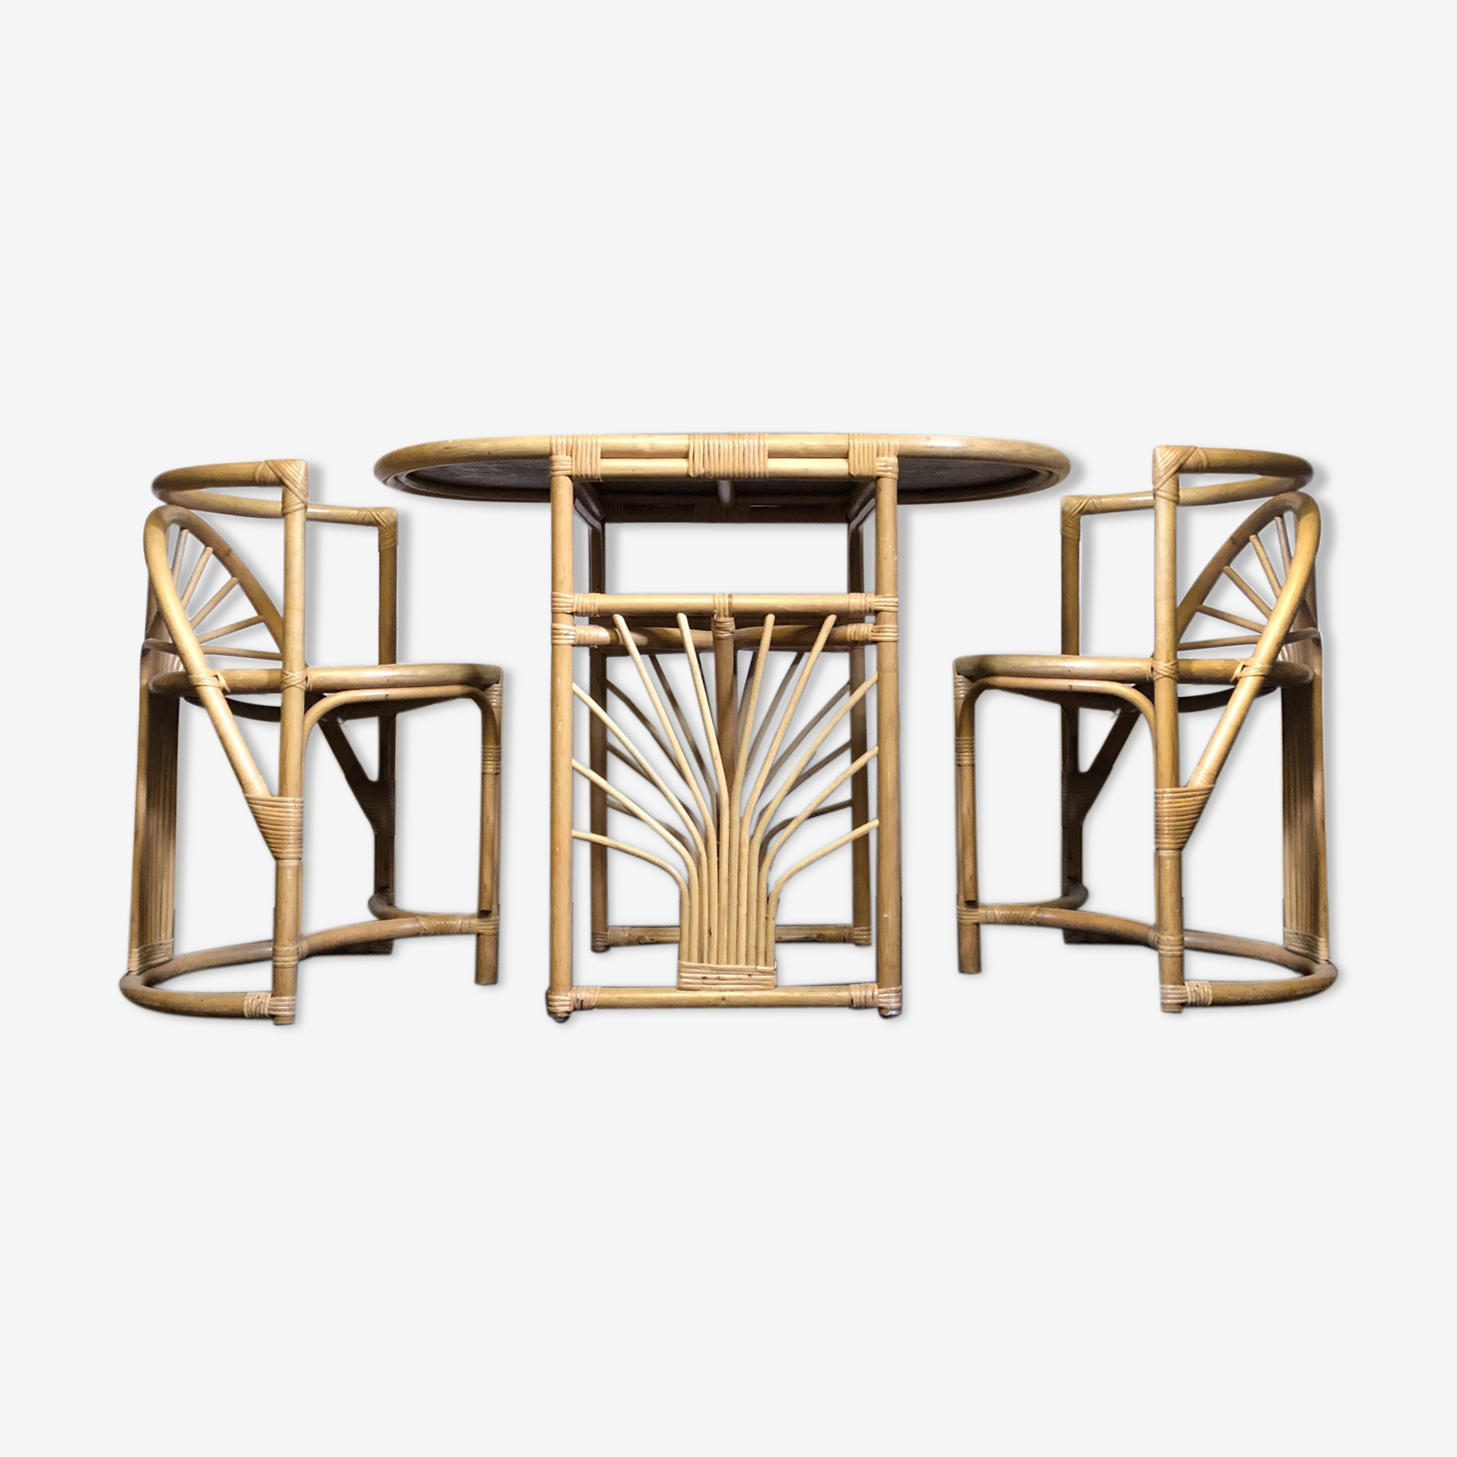 Table Chaises Salle A Manger En Osier Bambou Rotin Tiki Rotin Et